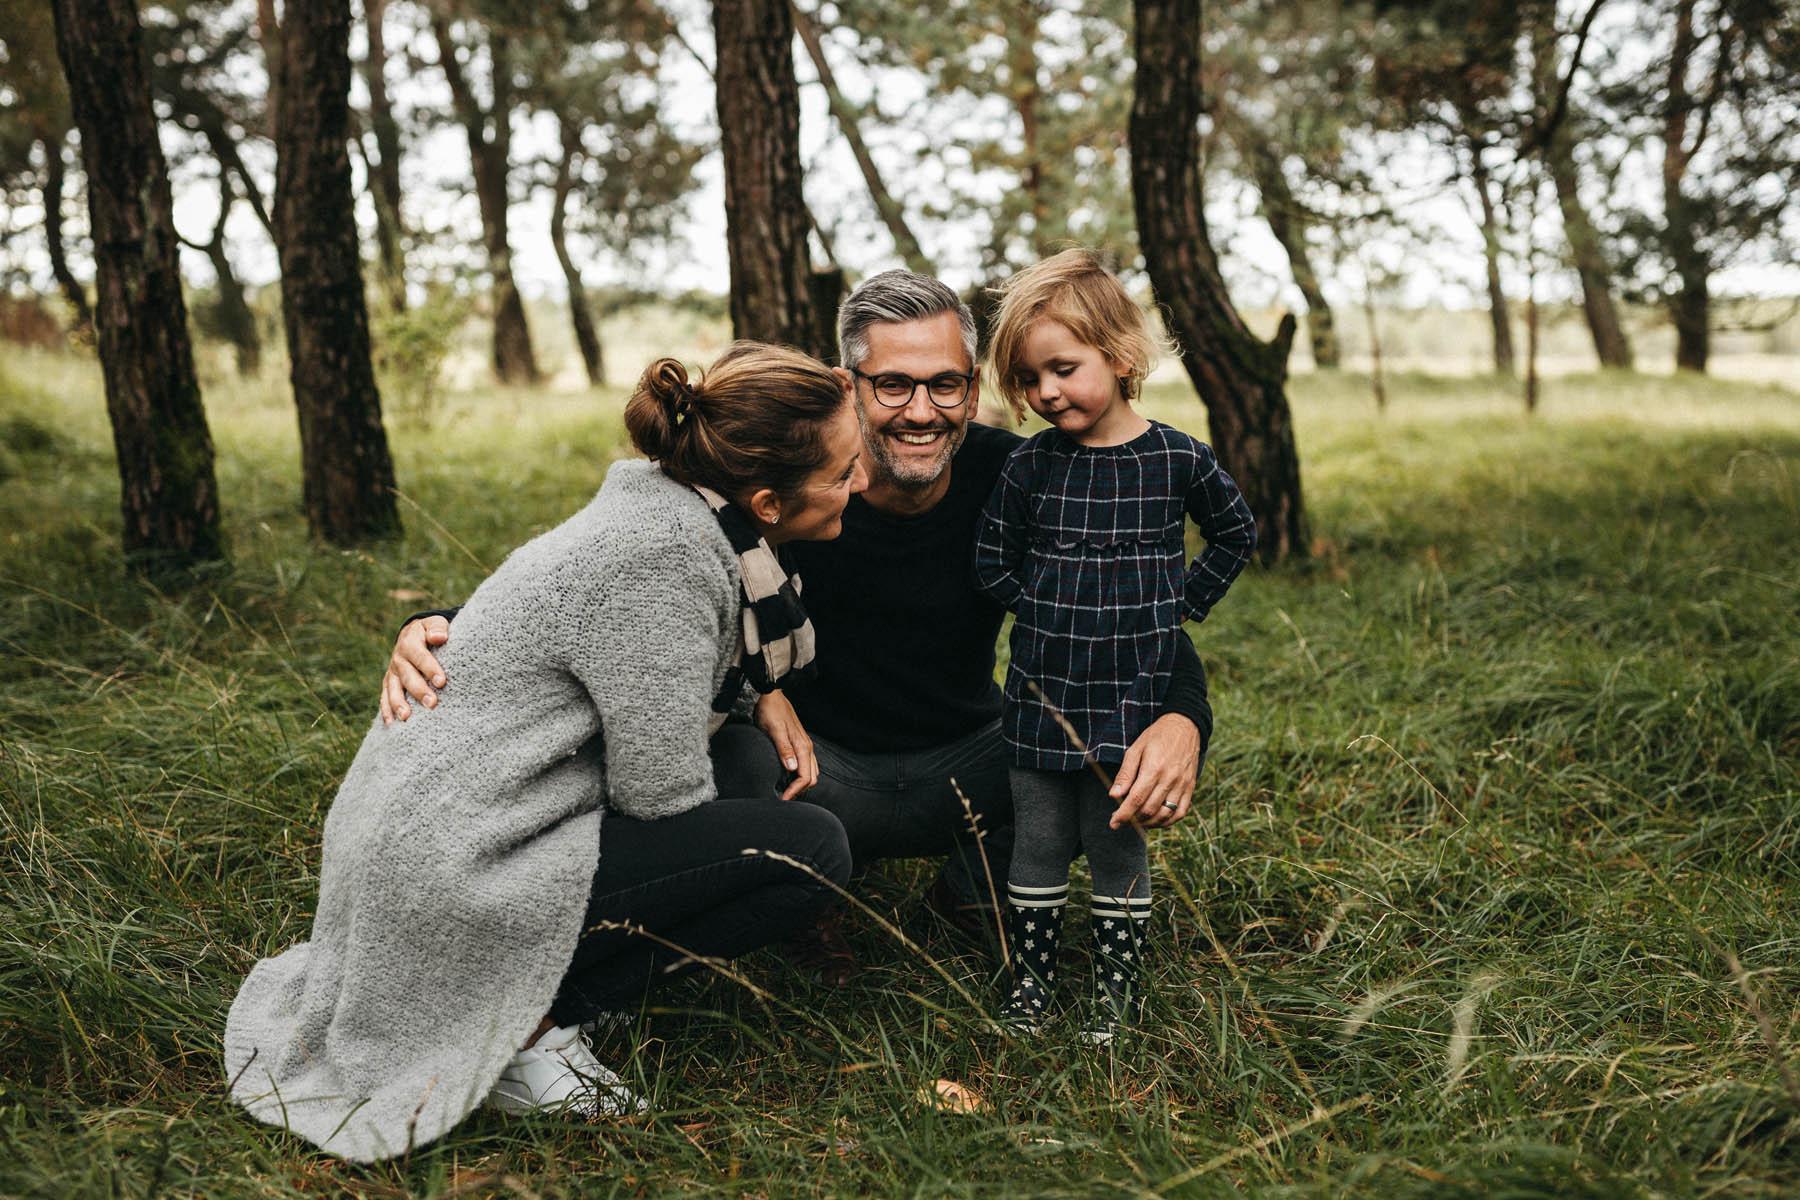 raissa simon fotografie familienfotos froettmaninger heide 064 - Annabel, Steffen + Cleo